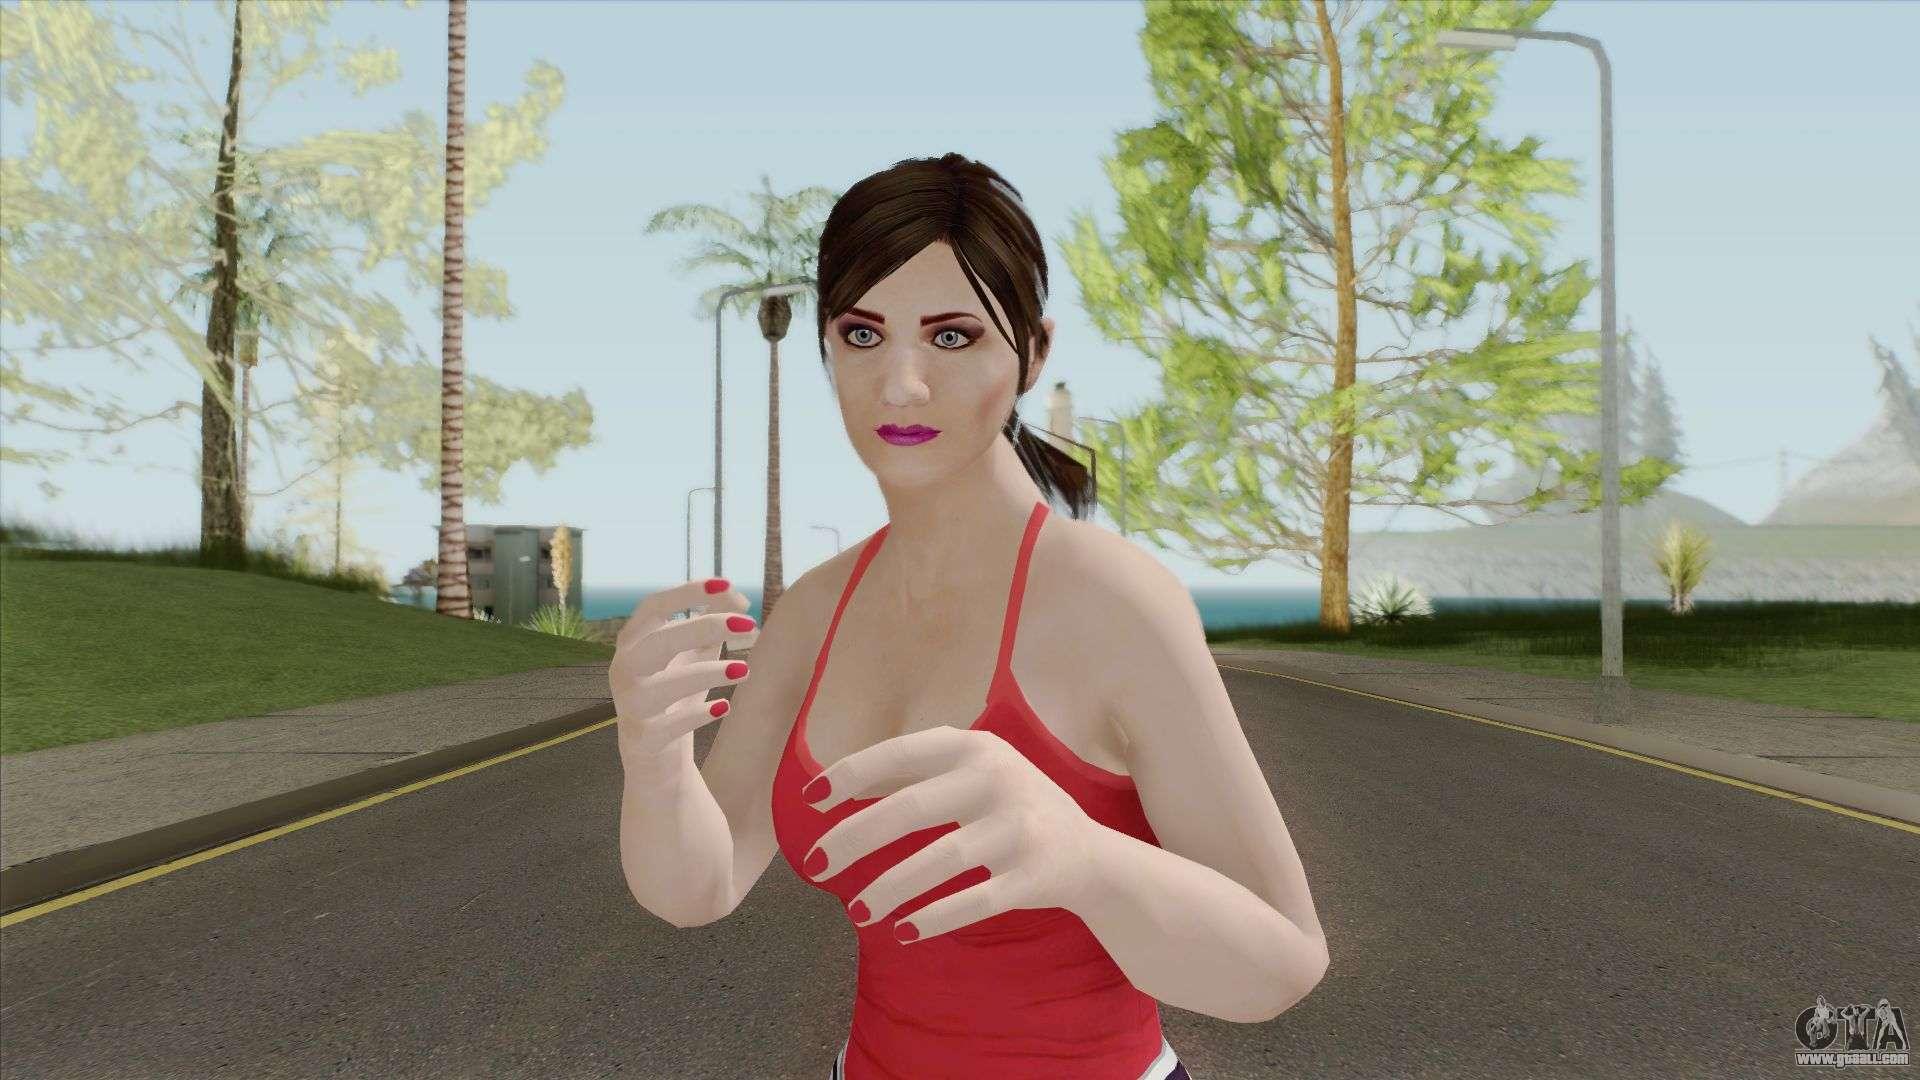 Amanda The Hot Gta V For Gta San Andreas-9186